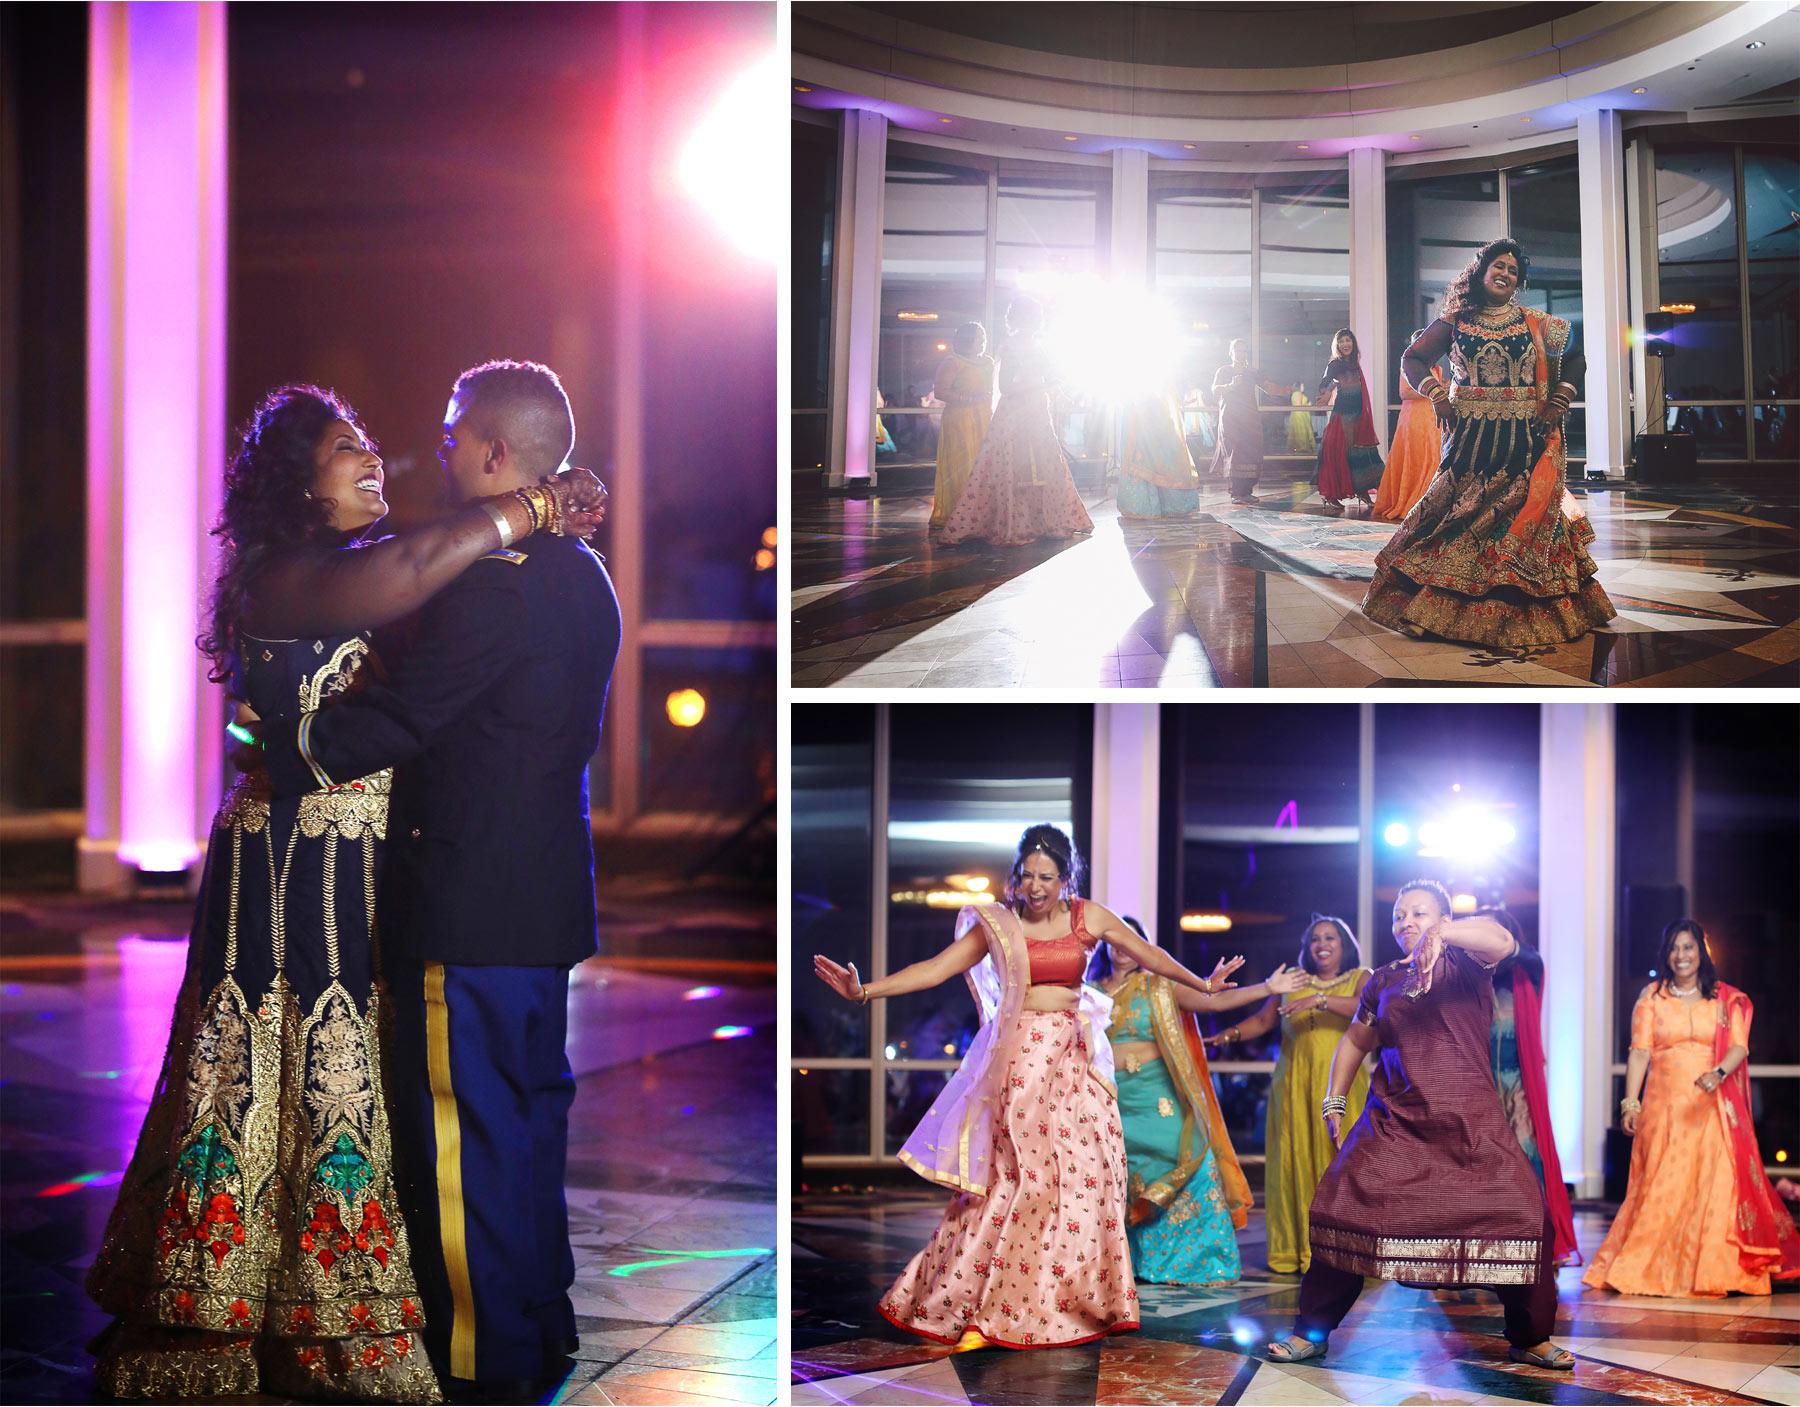 23-St-Paul-Minnesota-Wedding-Photography-by-Vick-Photography-Intercontinental-St-Paul-Riverfront-Reception-Dancing-Leena-and-Michael.jpg